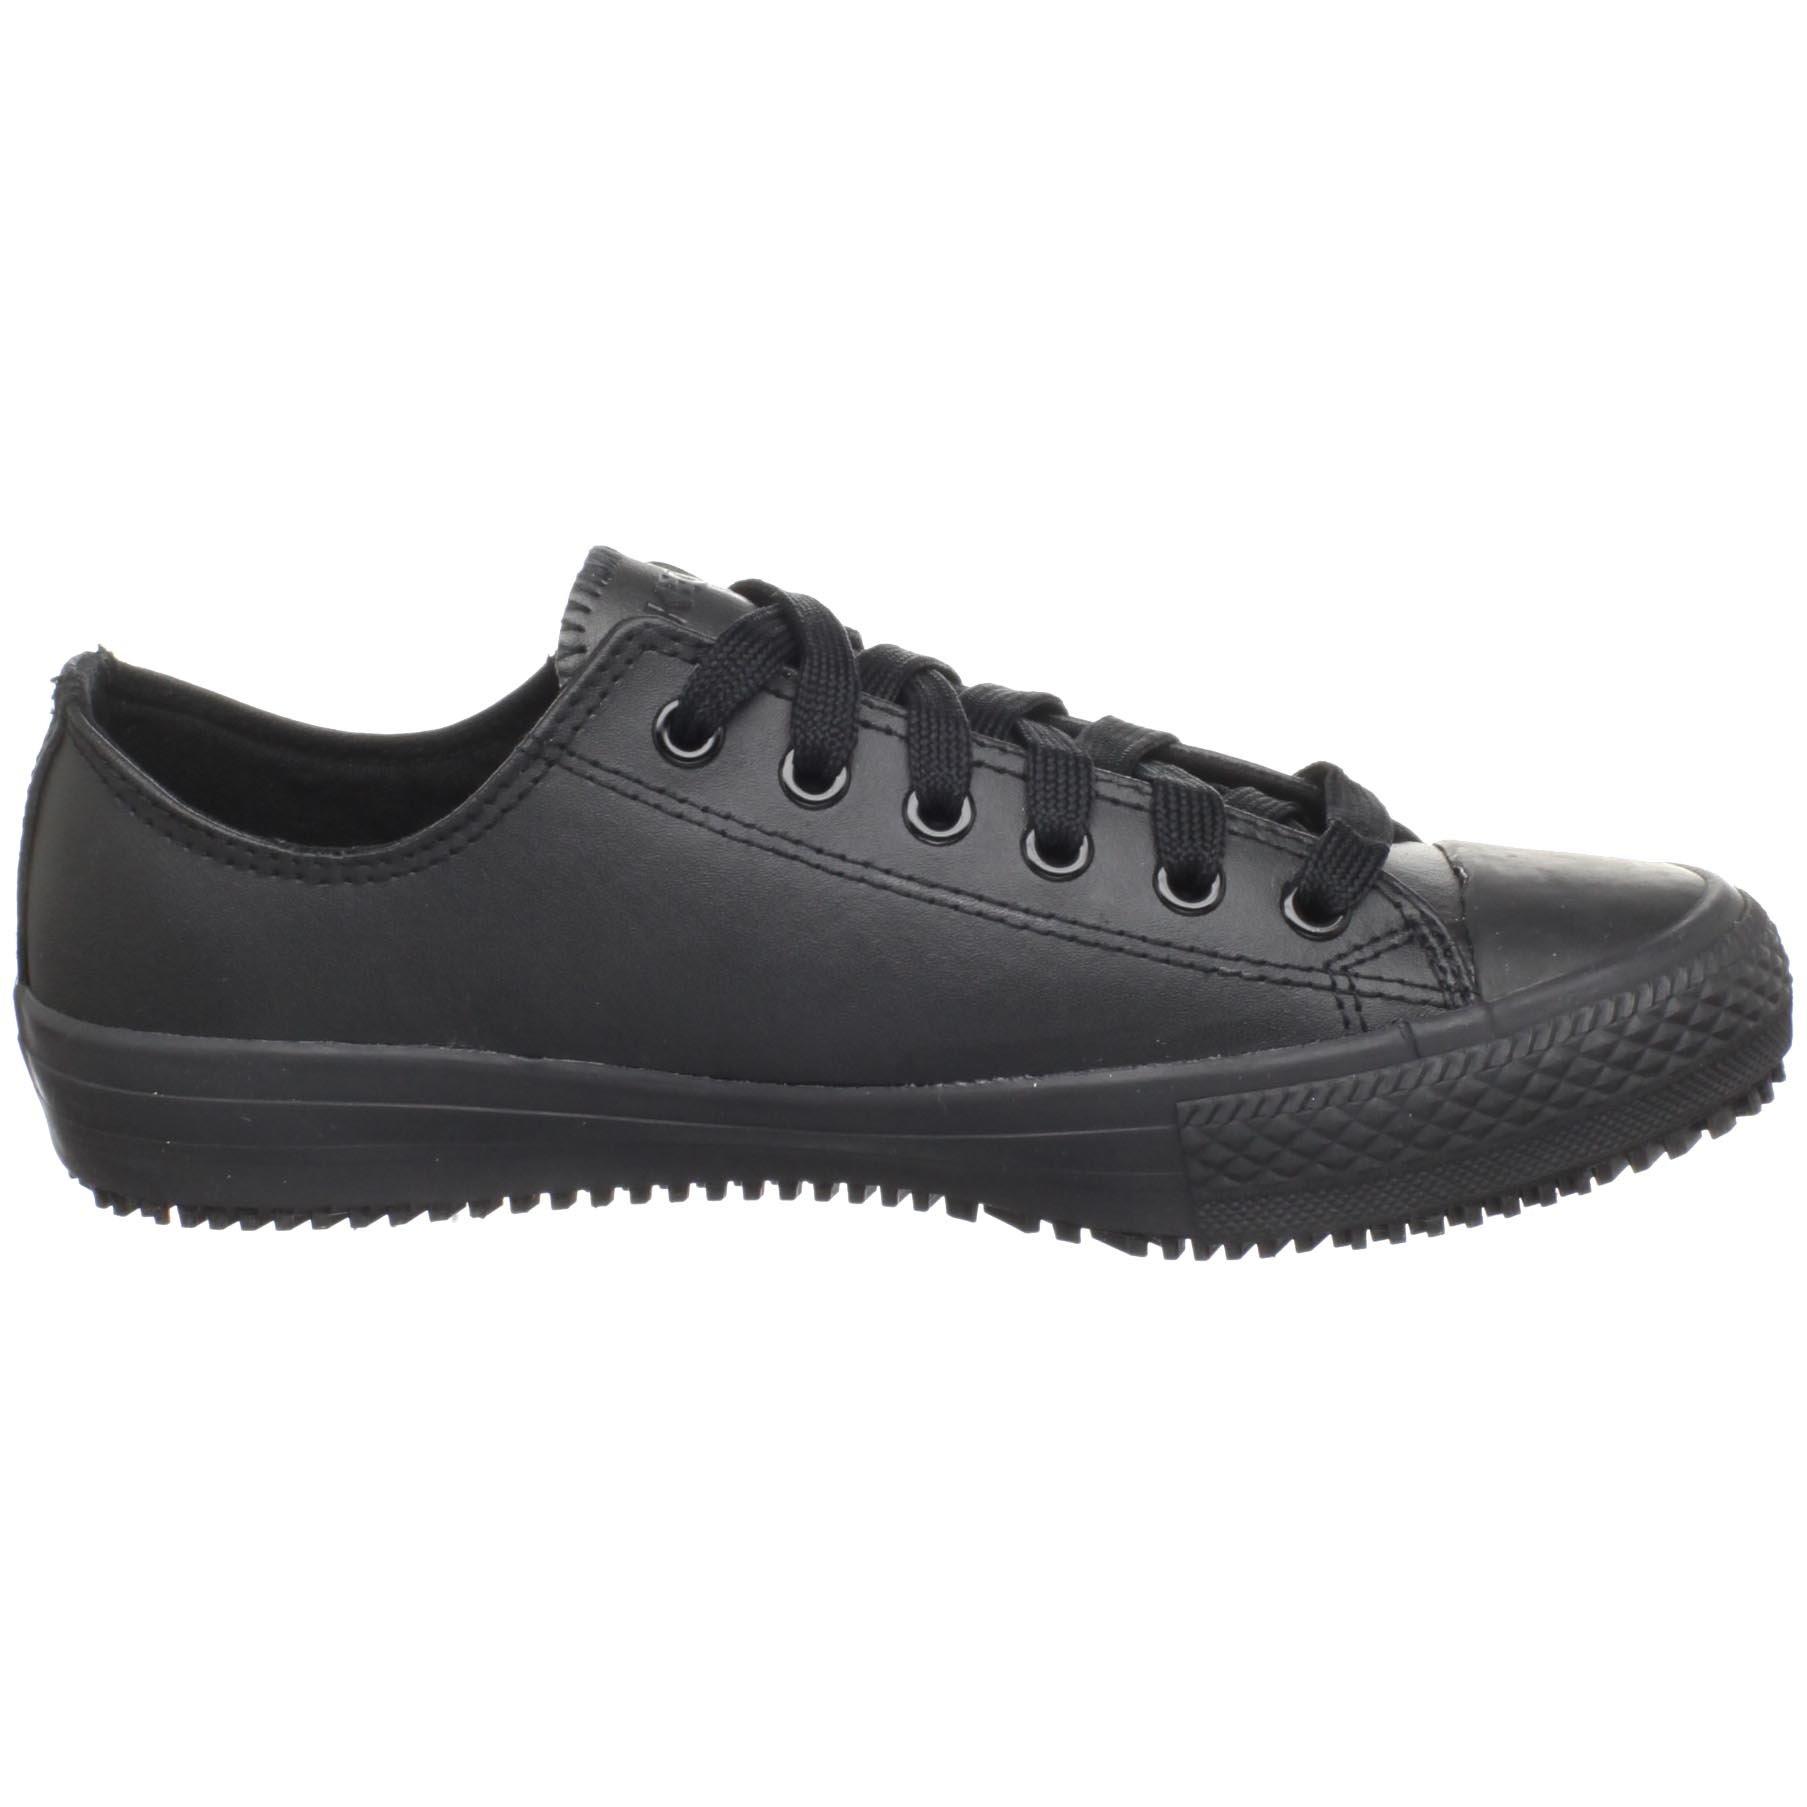 Skechers for Work Women's Gibson-Hardwood Slip-Resistant Sneaker, Black, 8 M US by Skechers (Image #6)